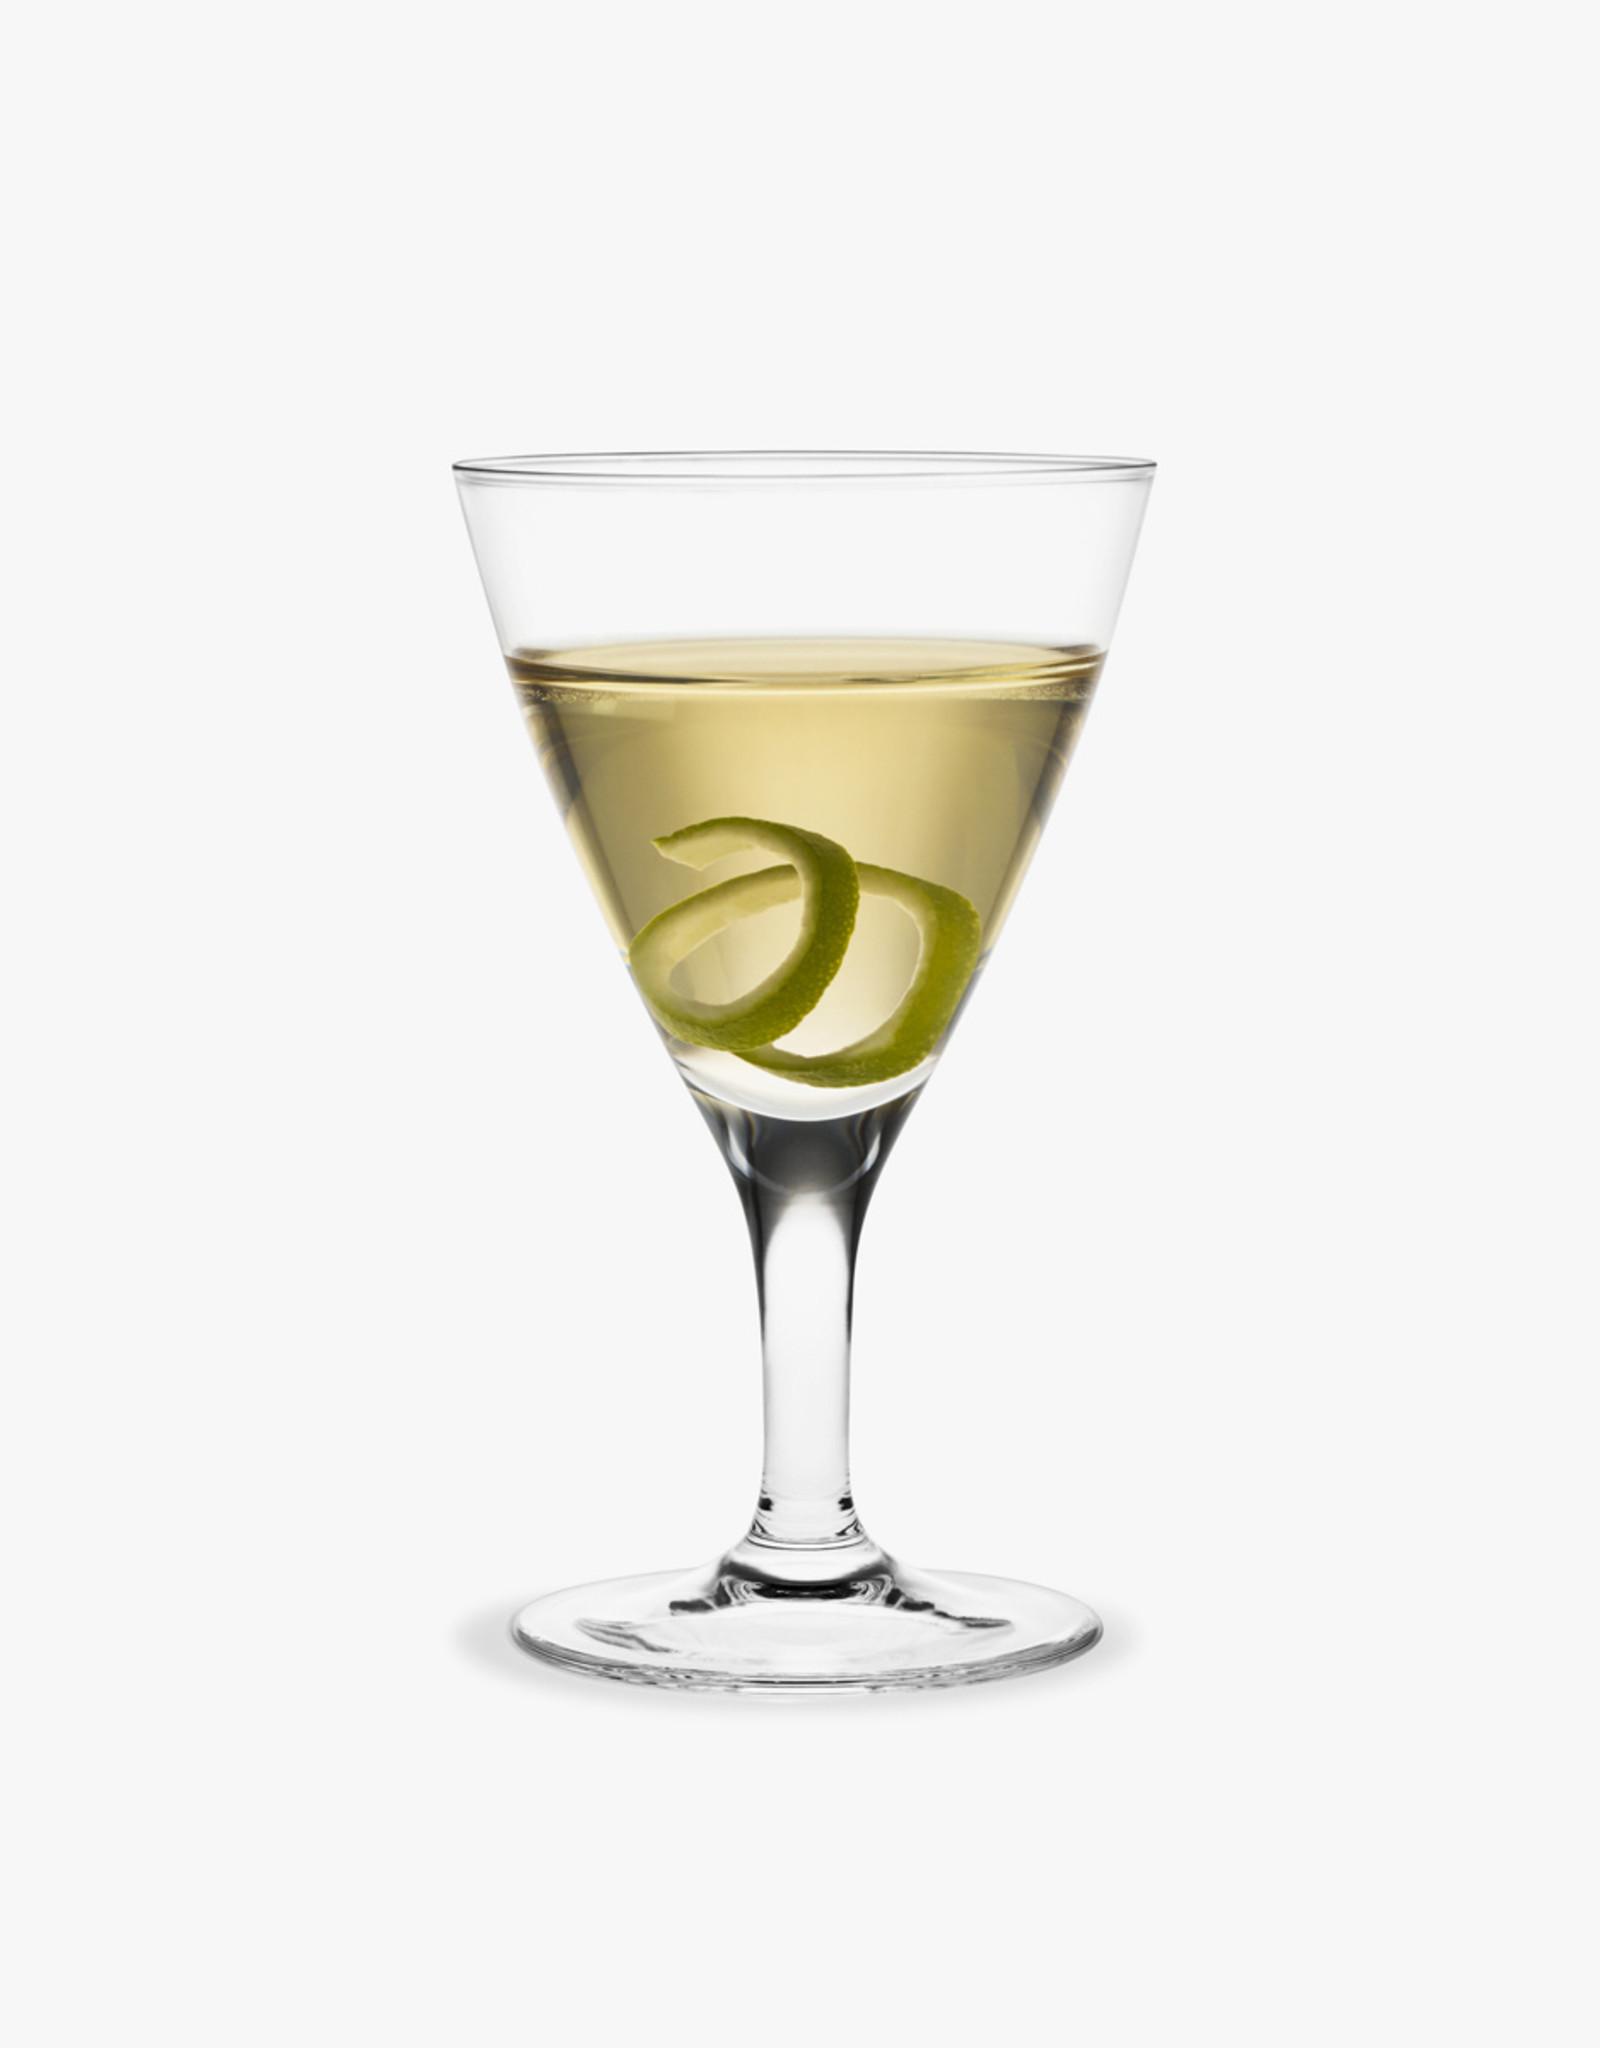 Royal Cocktail Glasses by Arne Jacobsen | Set of 6 | 20cl